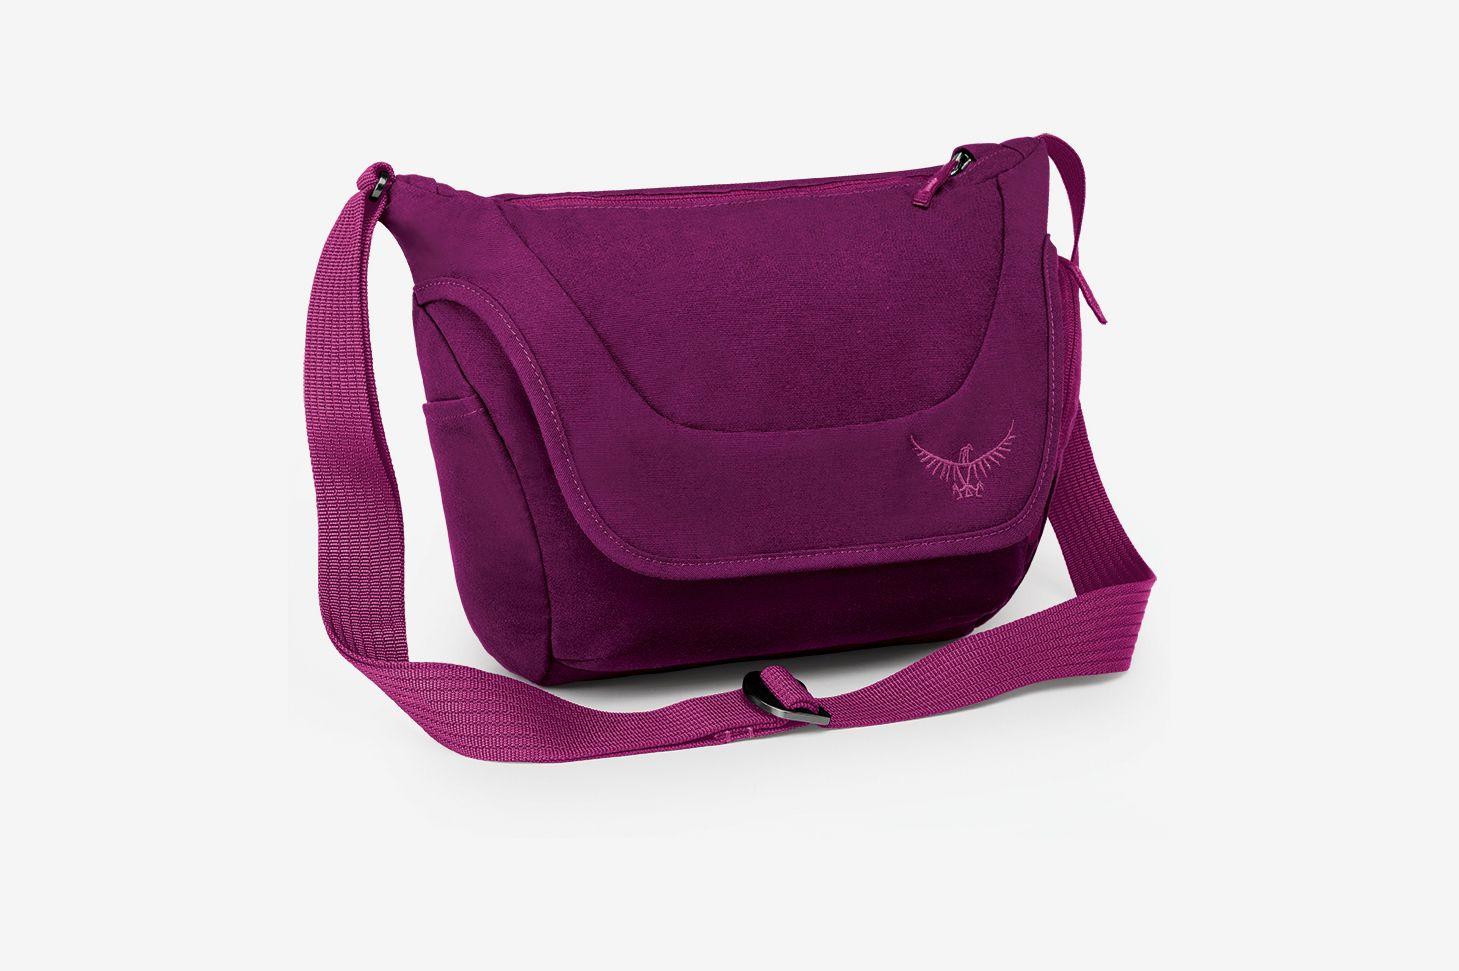 Fashion Ladies Fabric Light Weight Cross Body Messenger Bag Women Shoulder Tote